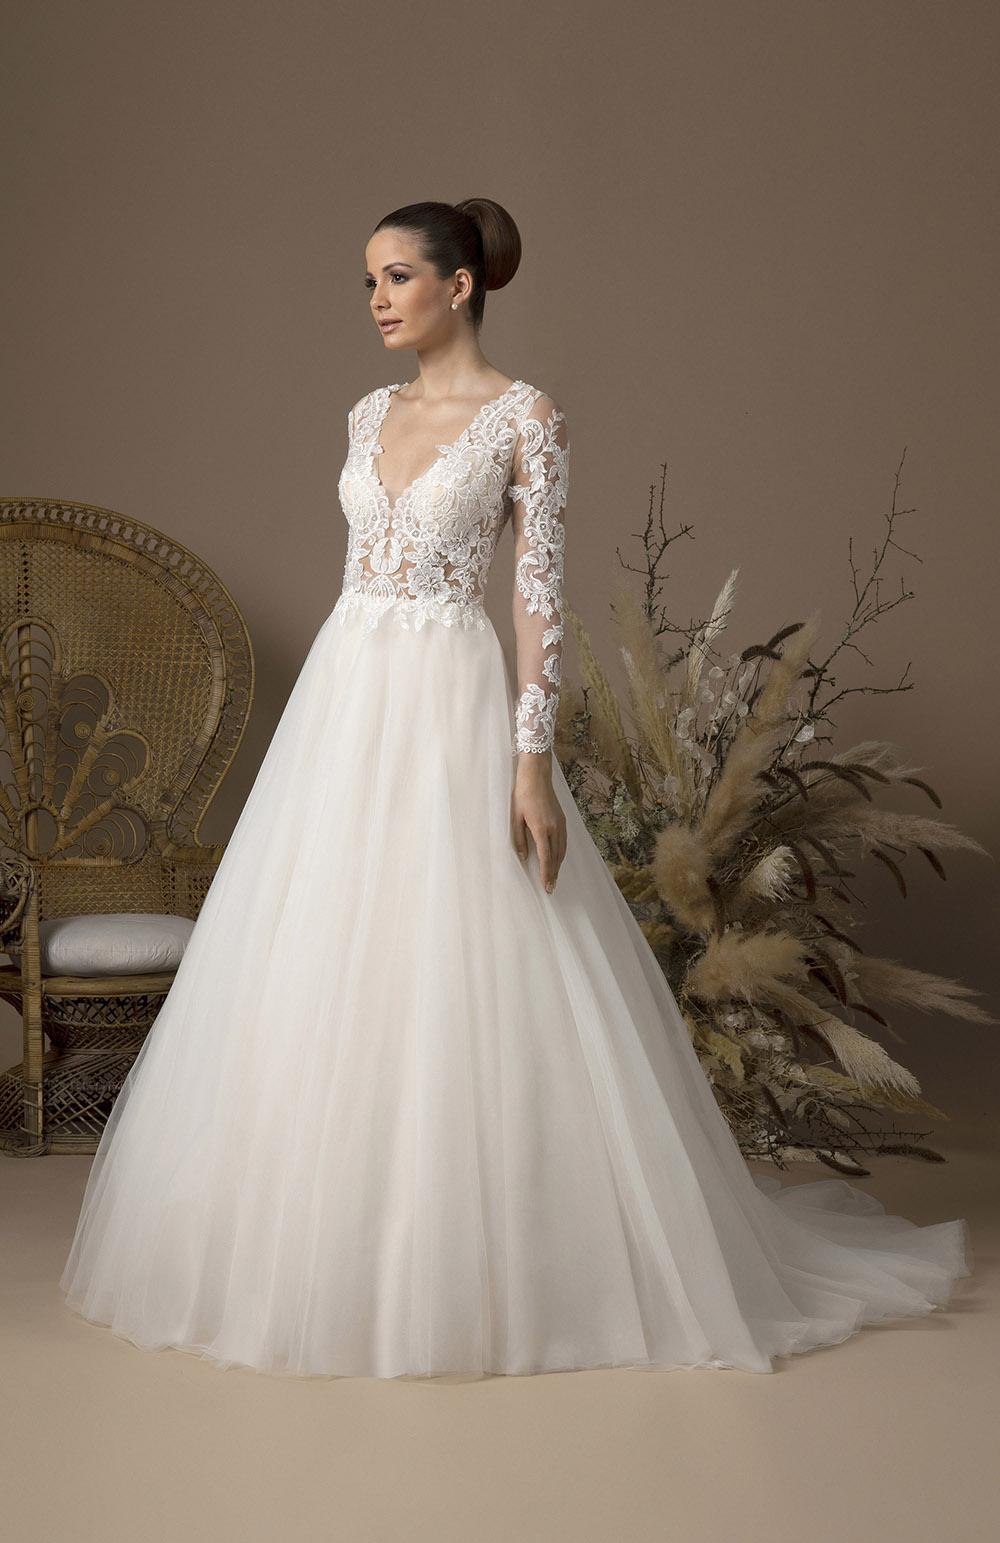 Robe de mariée Modèle Darice